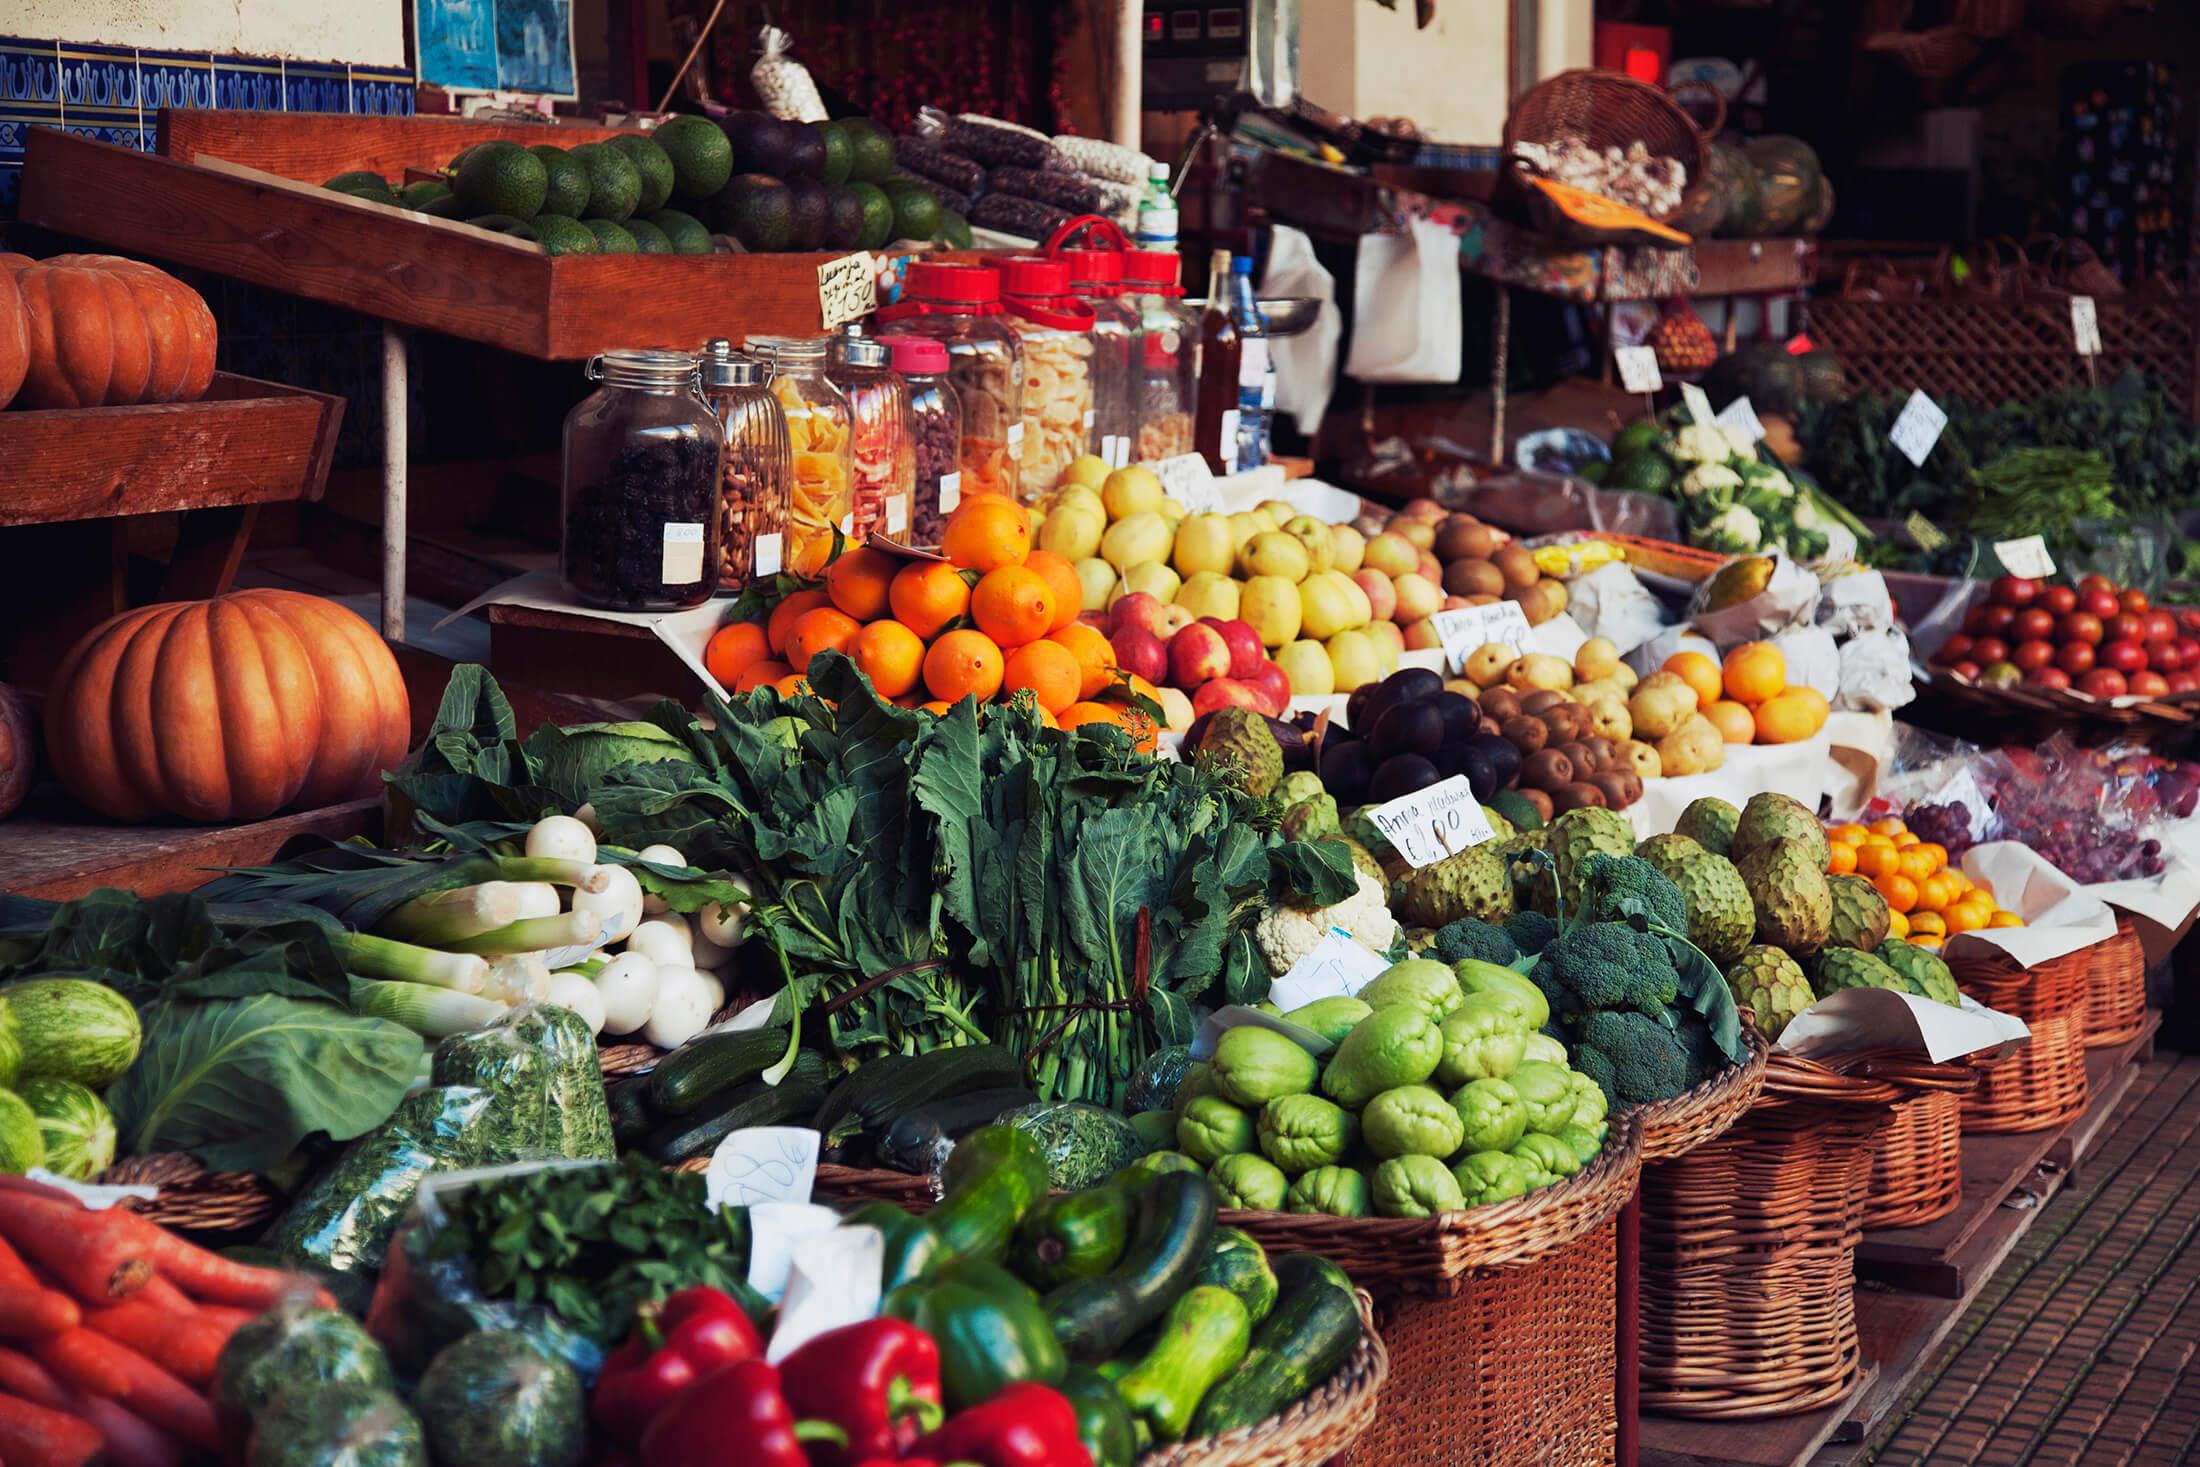 Fresh veggies at a market